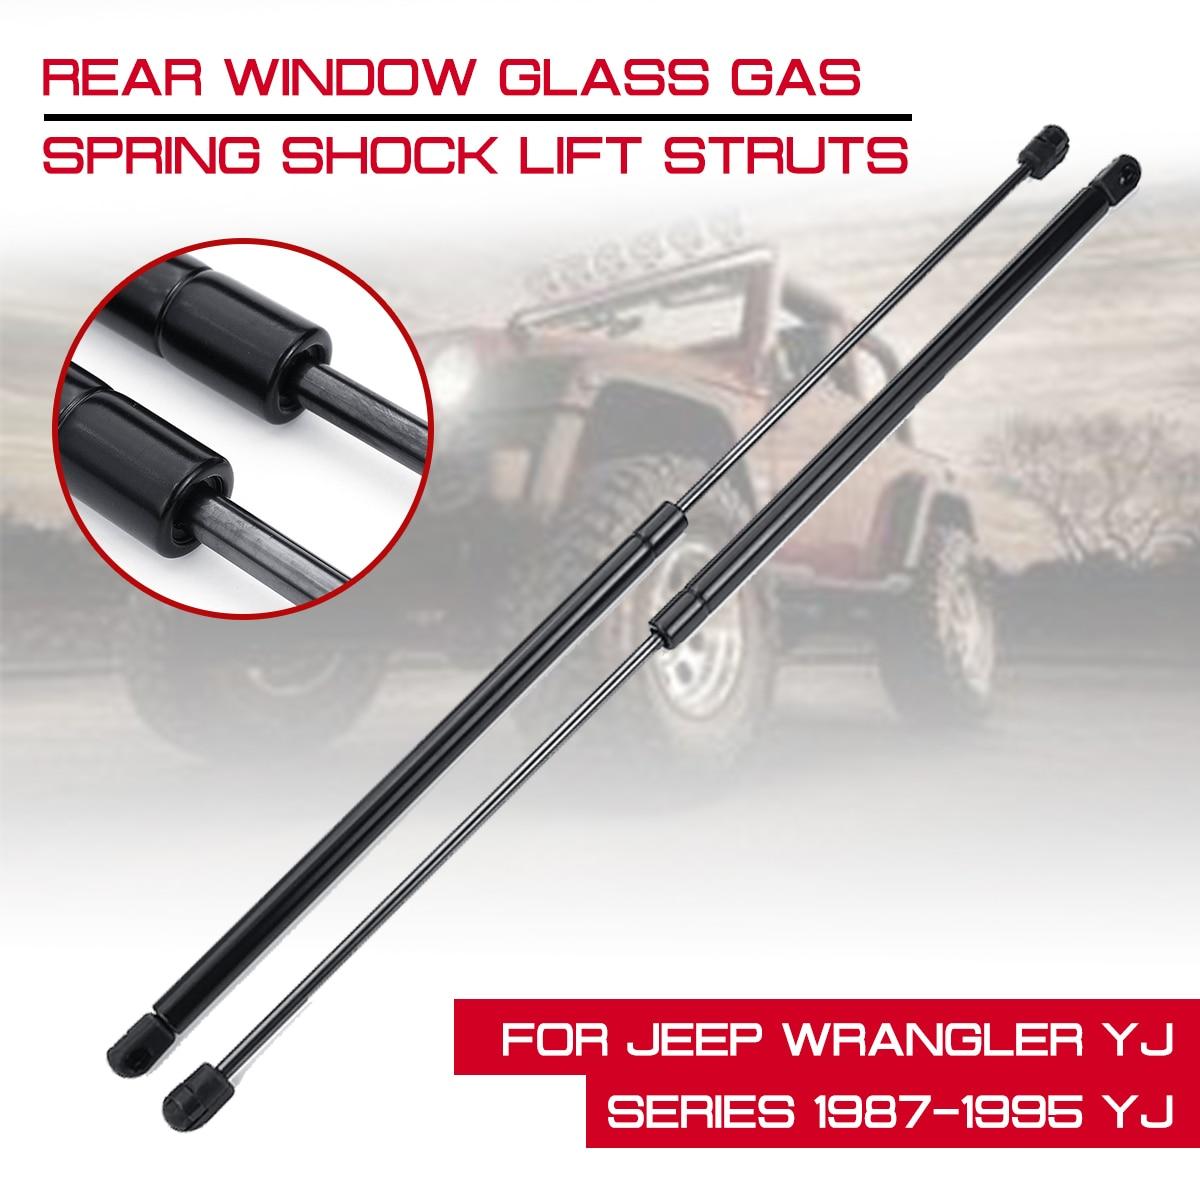 Для Jeep Wrangler YJ серии 1987 1988 1989-1995 YJ 644 мм стекло на заднее стекло газовая пружина амортизатор стойки опорная штанга рукоятка